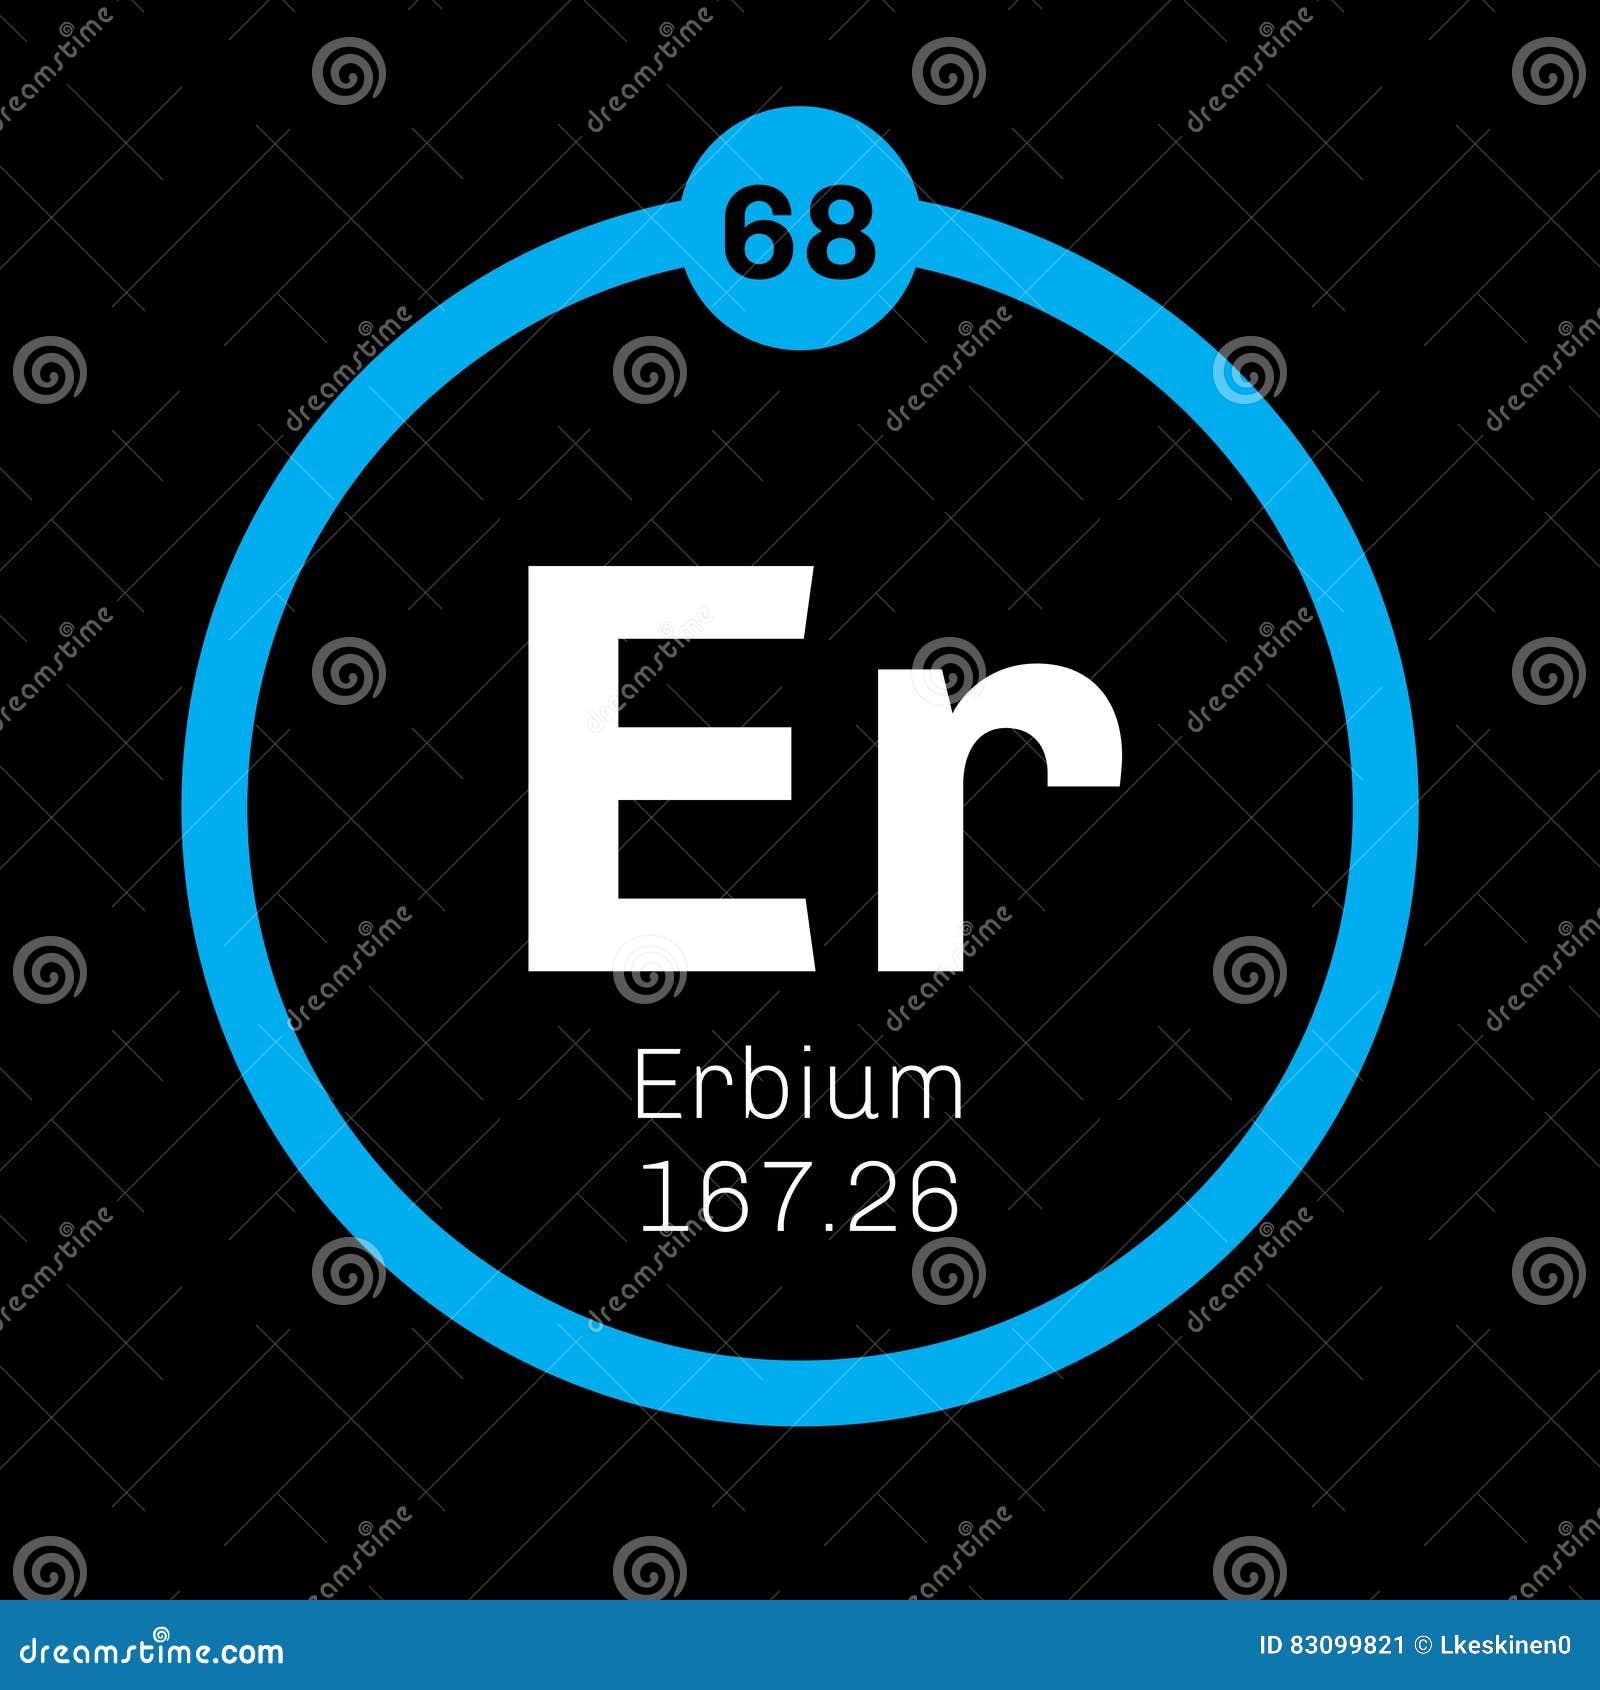 Erbium Chemical Element Stock Vector Illustration Of Graphic 83099821